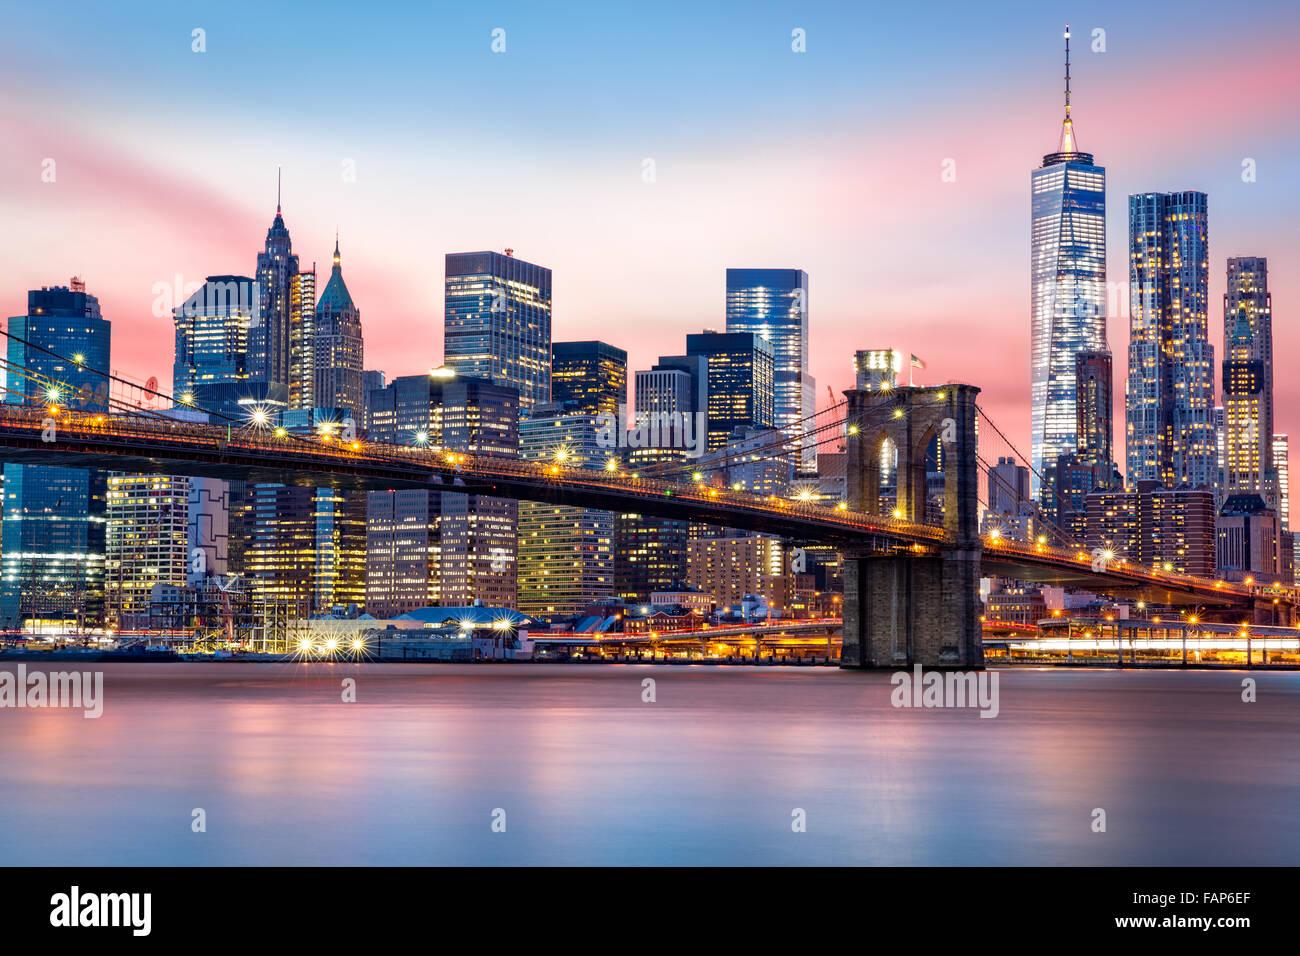 Brooklyn Bridge at and the Lower Manhattan skyline under a purple sunset - Stock Image